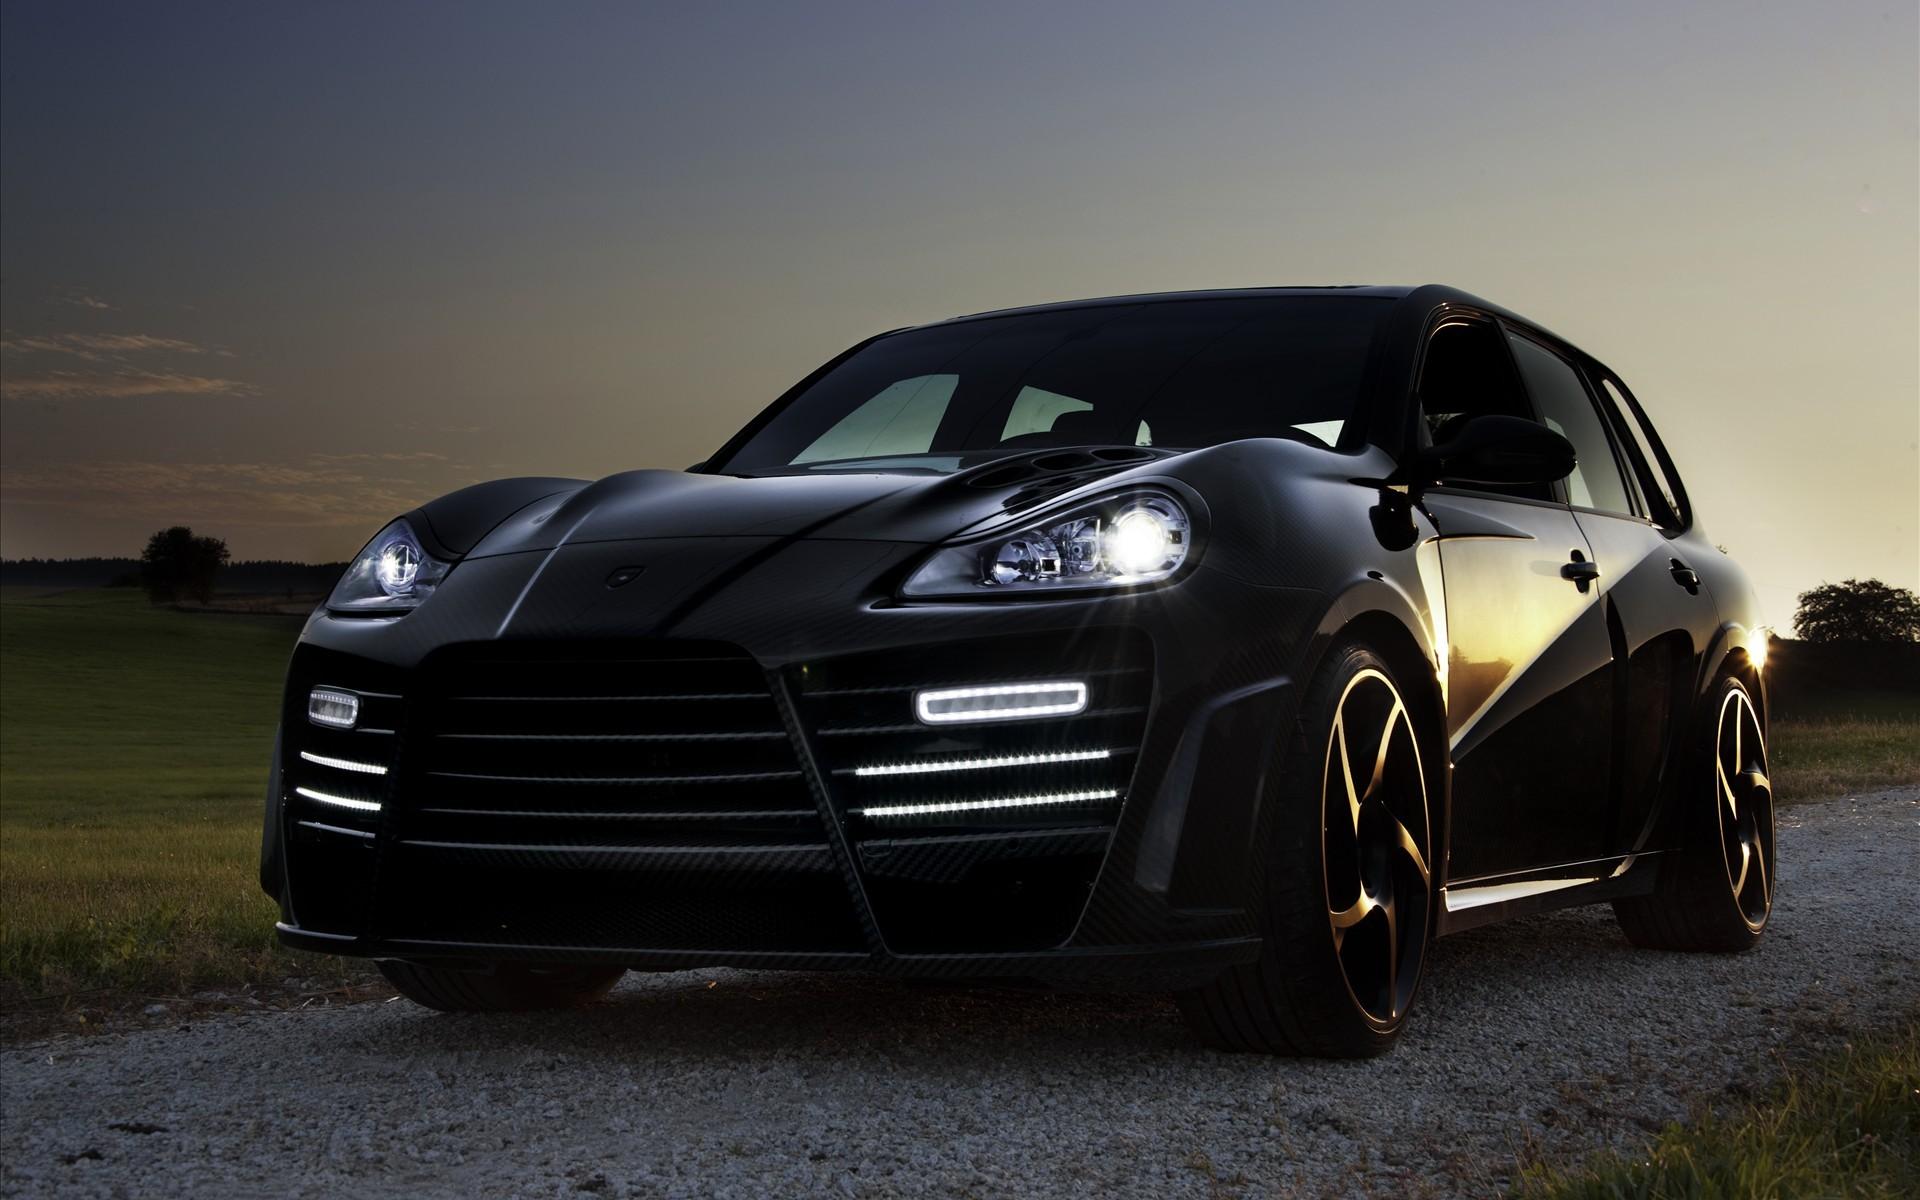 Porsche cayenne wallpaper download